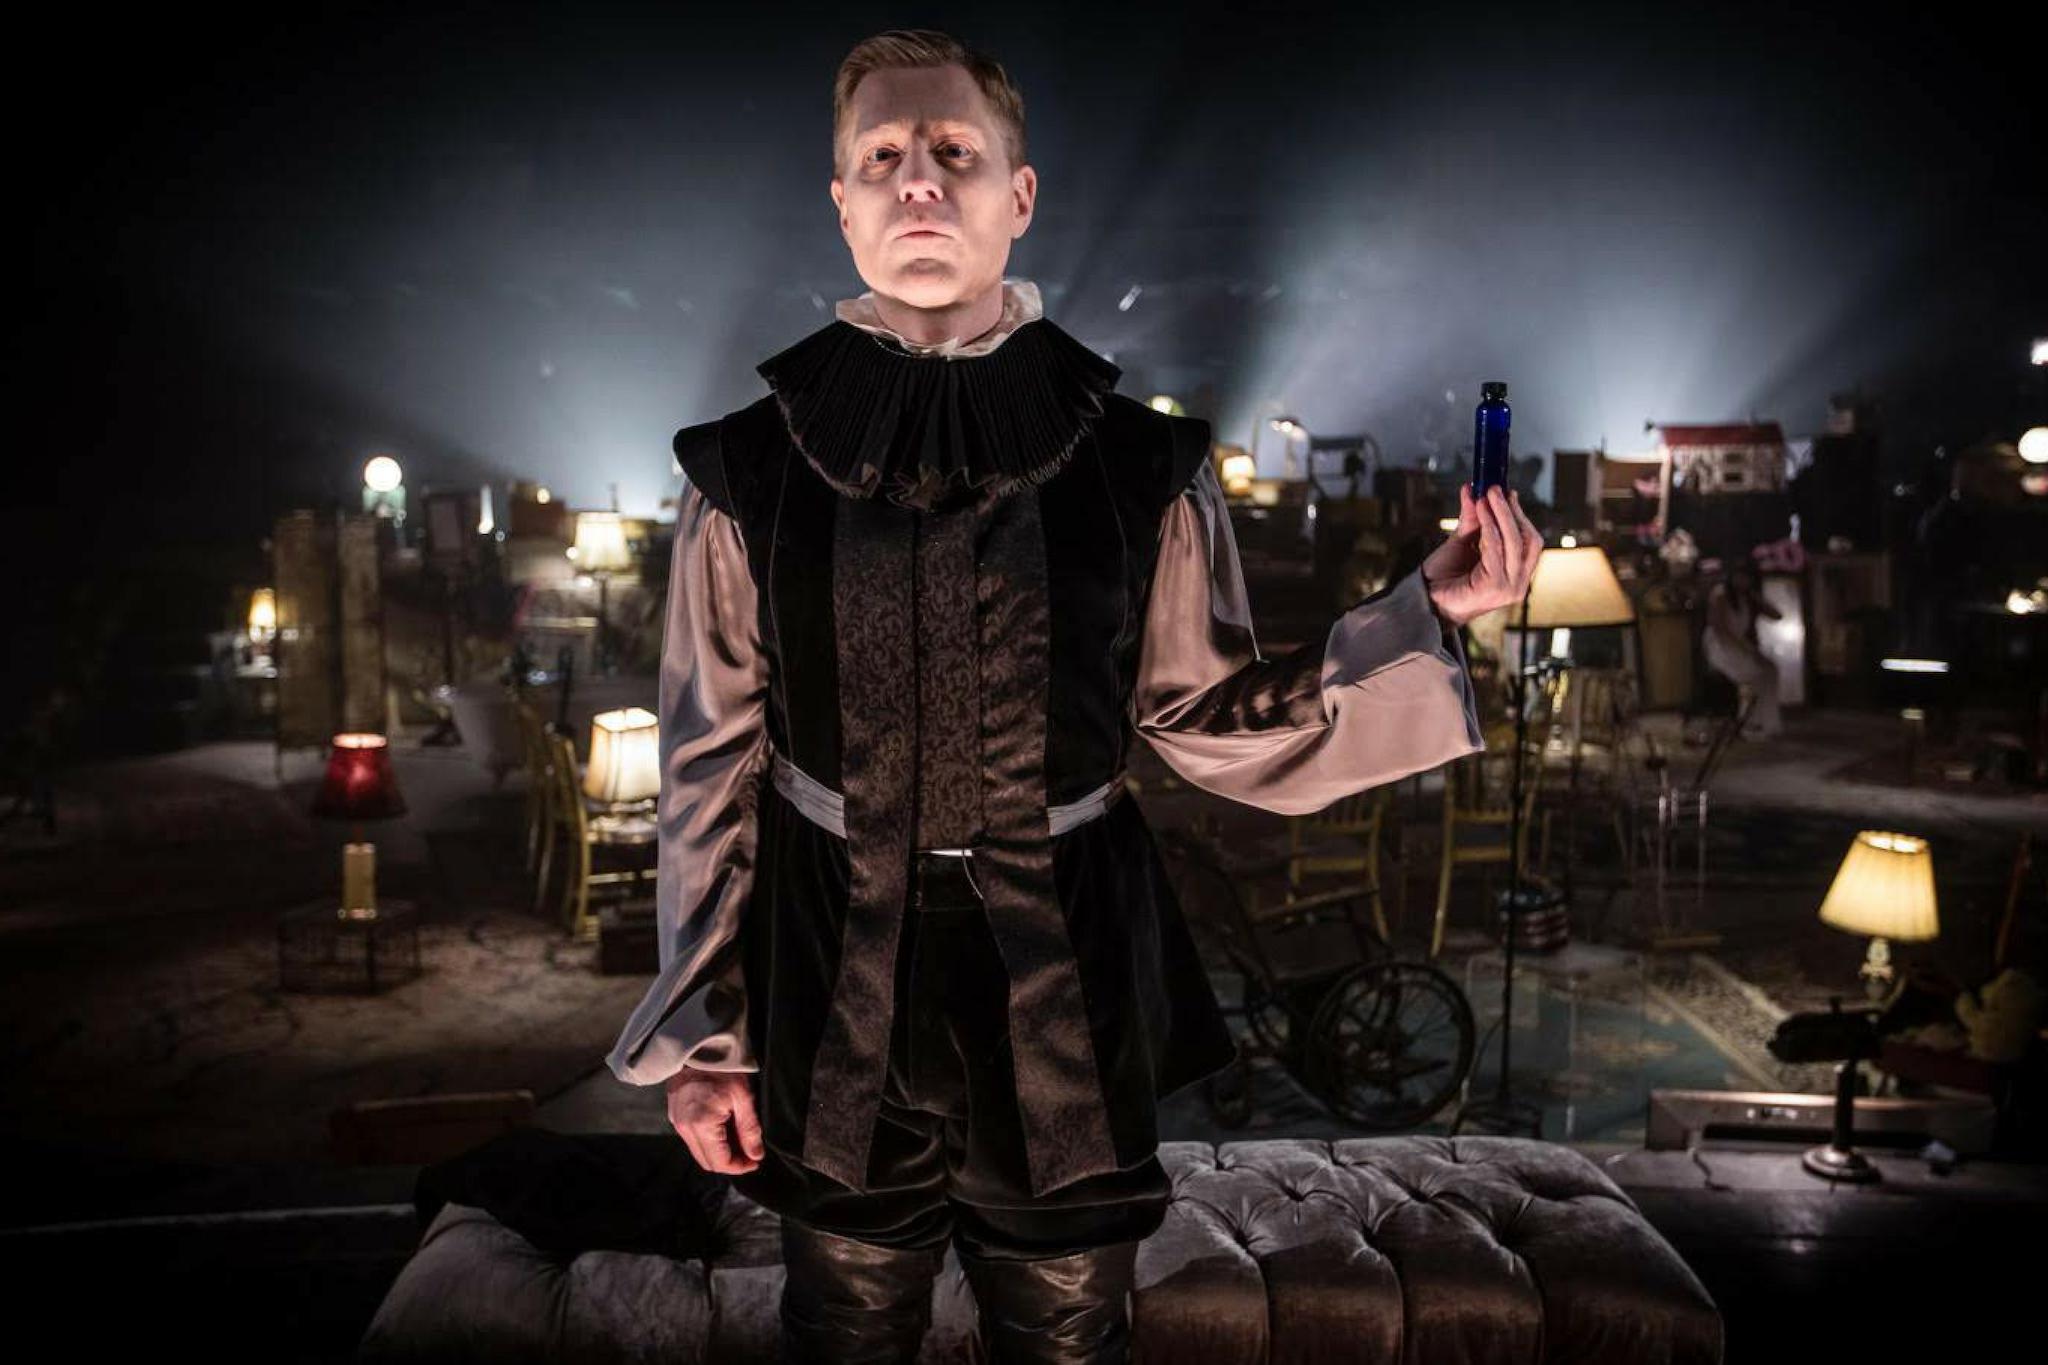 Anthony Rapp as Lucianus in Hamlet 360: Thy Father's Spirit. Photo by Matthew Niederhauser